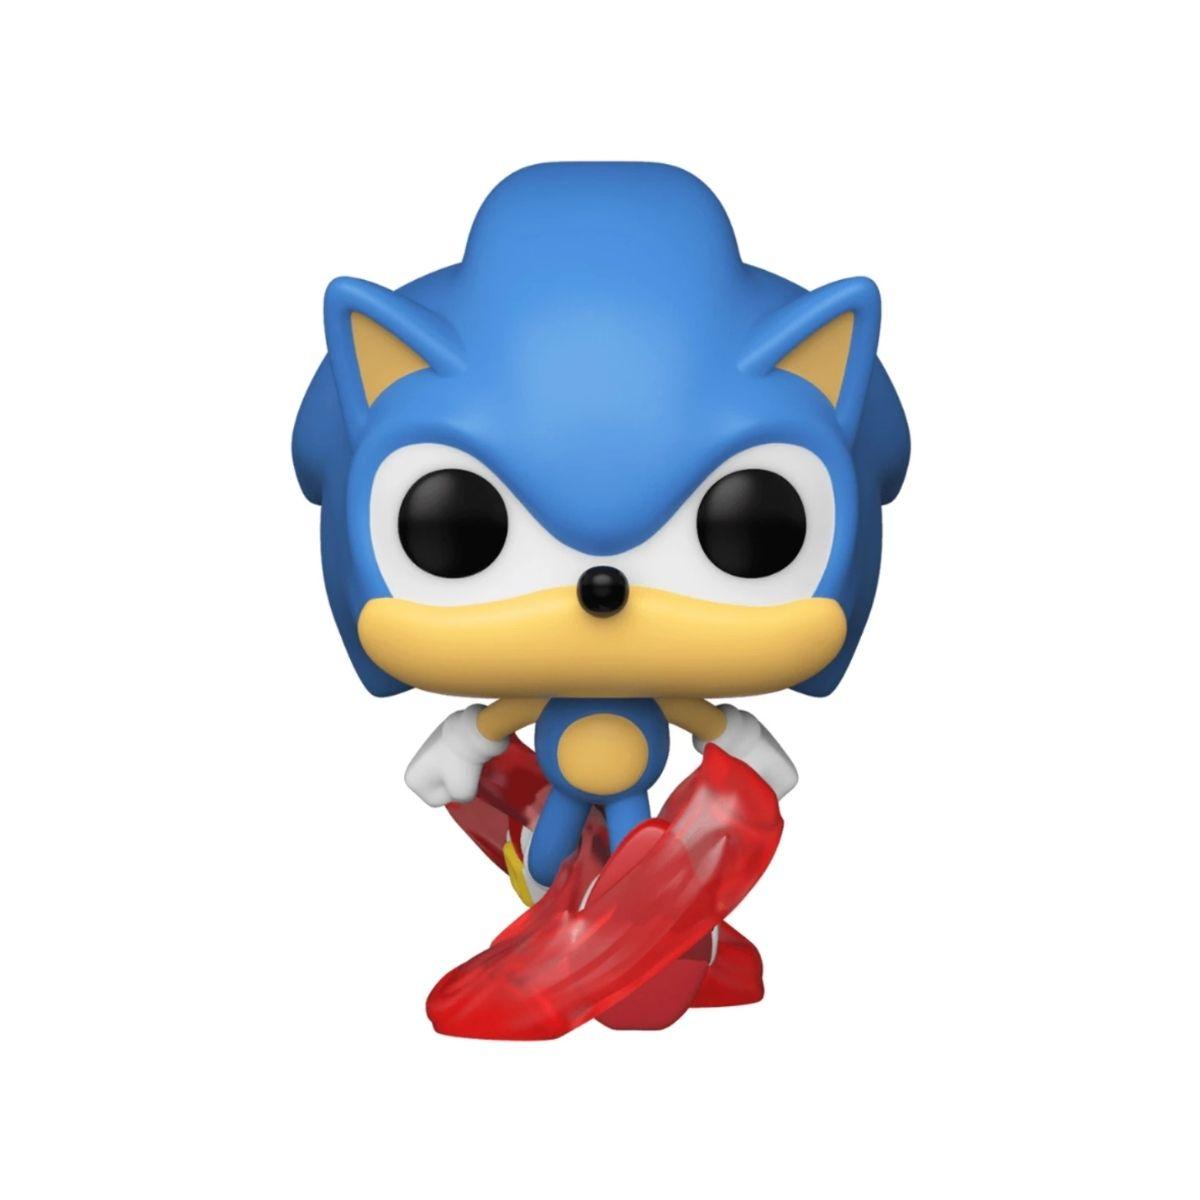 Funko Pop Games The Hedgehog Classic Sonic #632  - Game Land Brinquedos